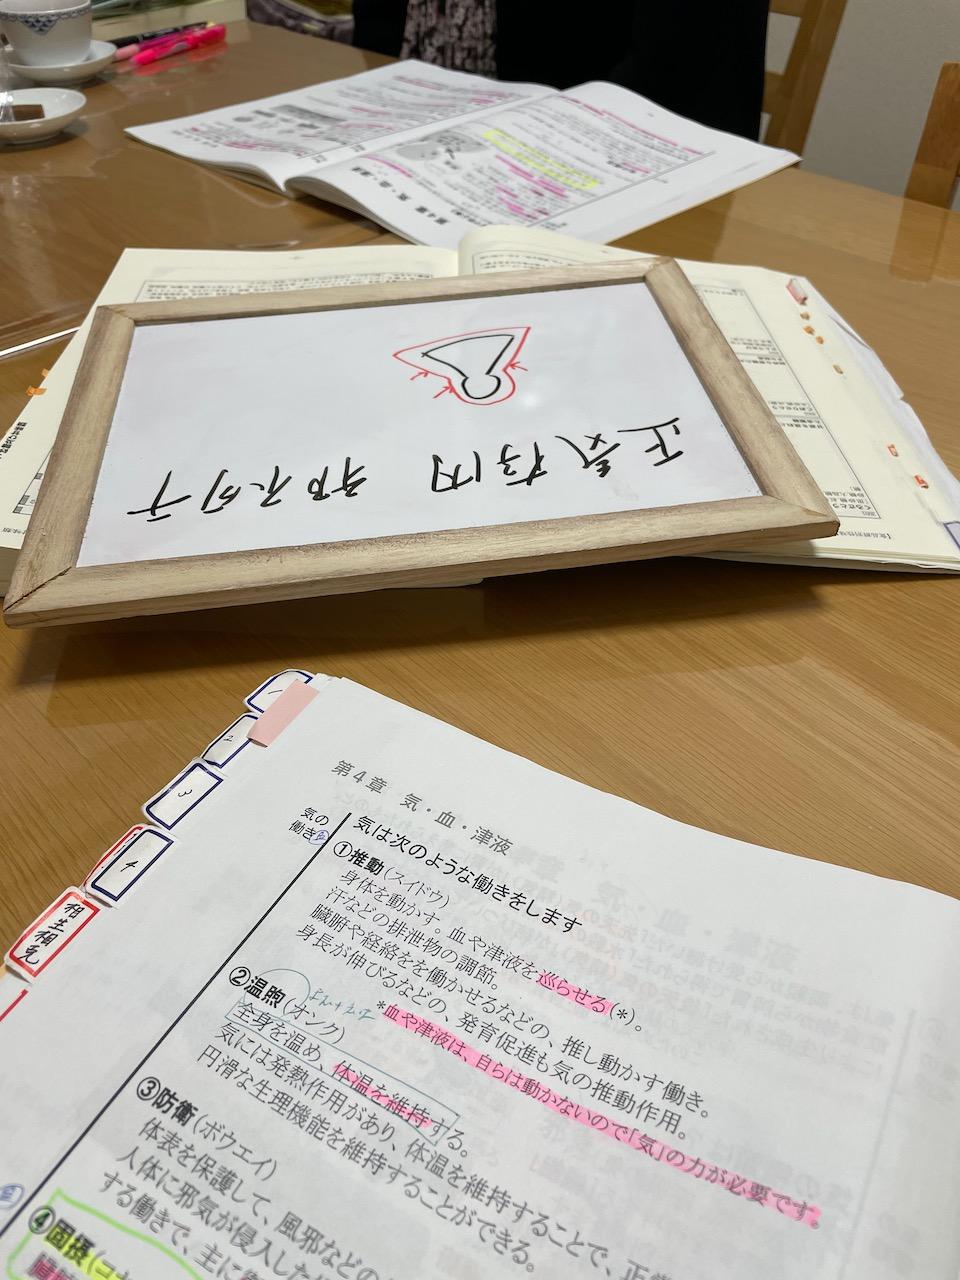 【20211018】558【薬膳と発酵食の教室 白檀*薬膳資格取得講座】